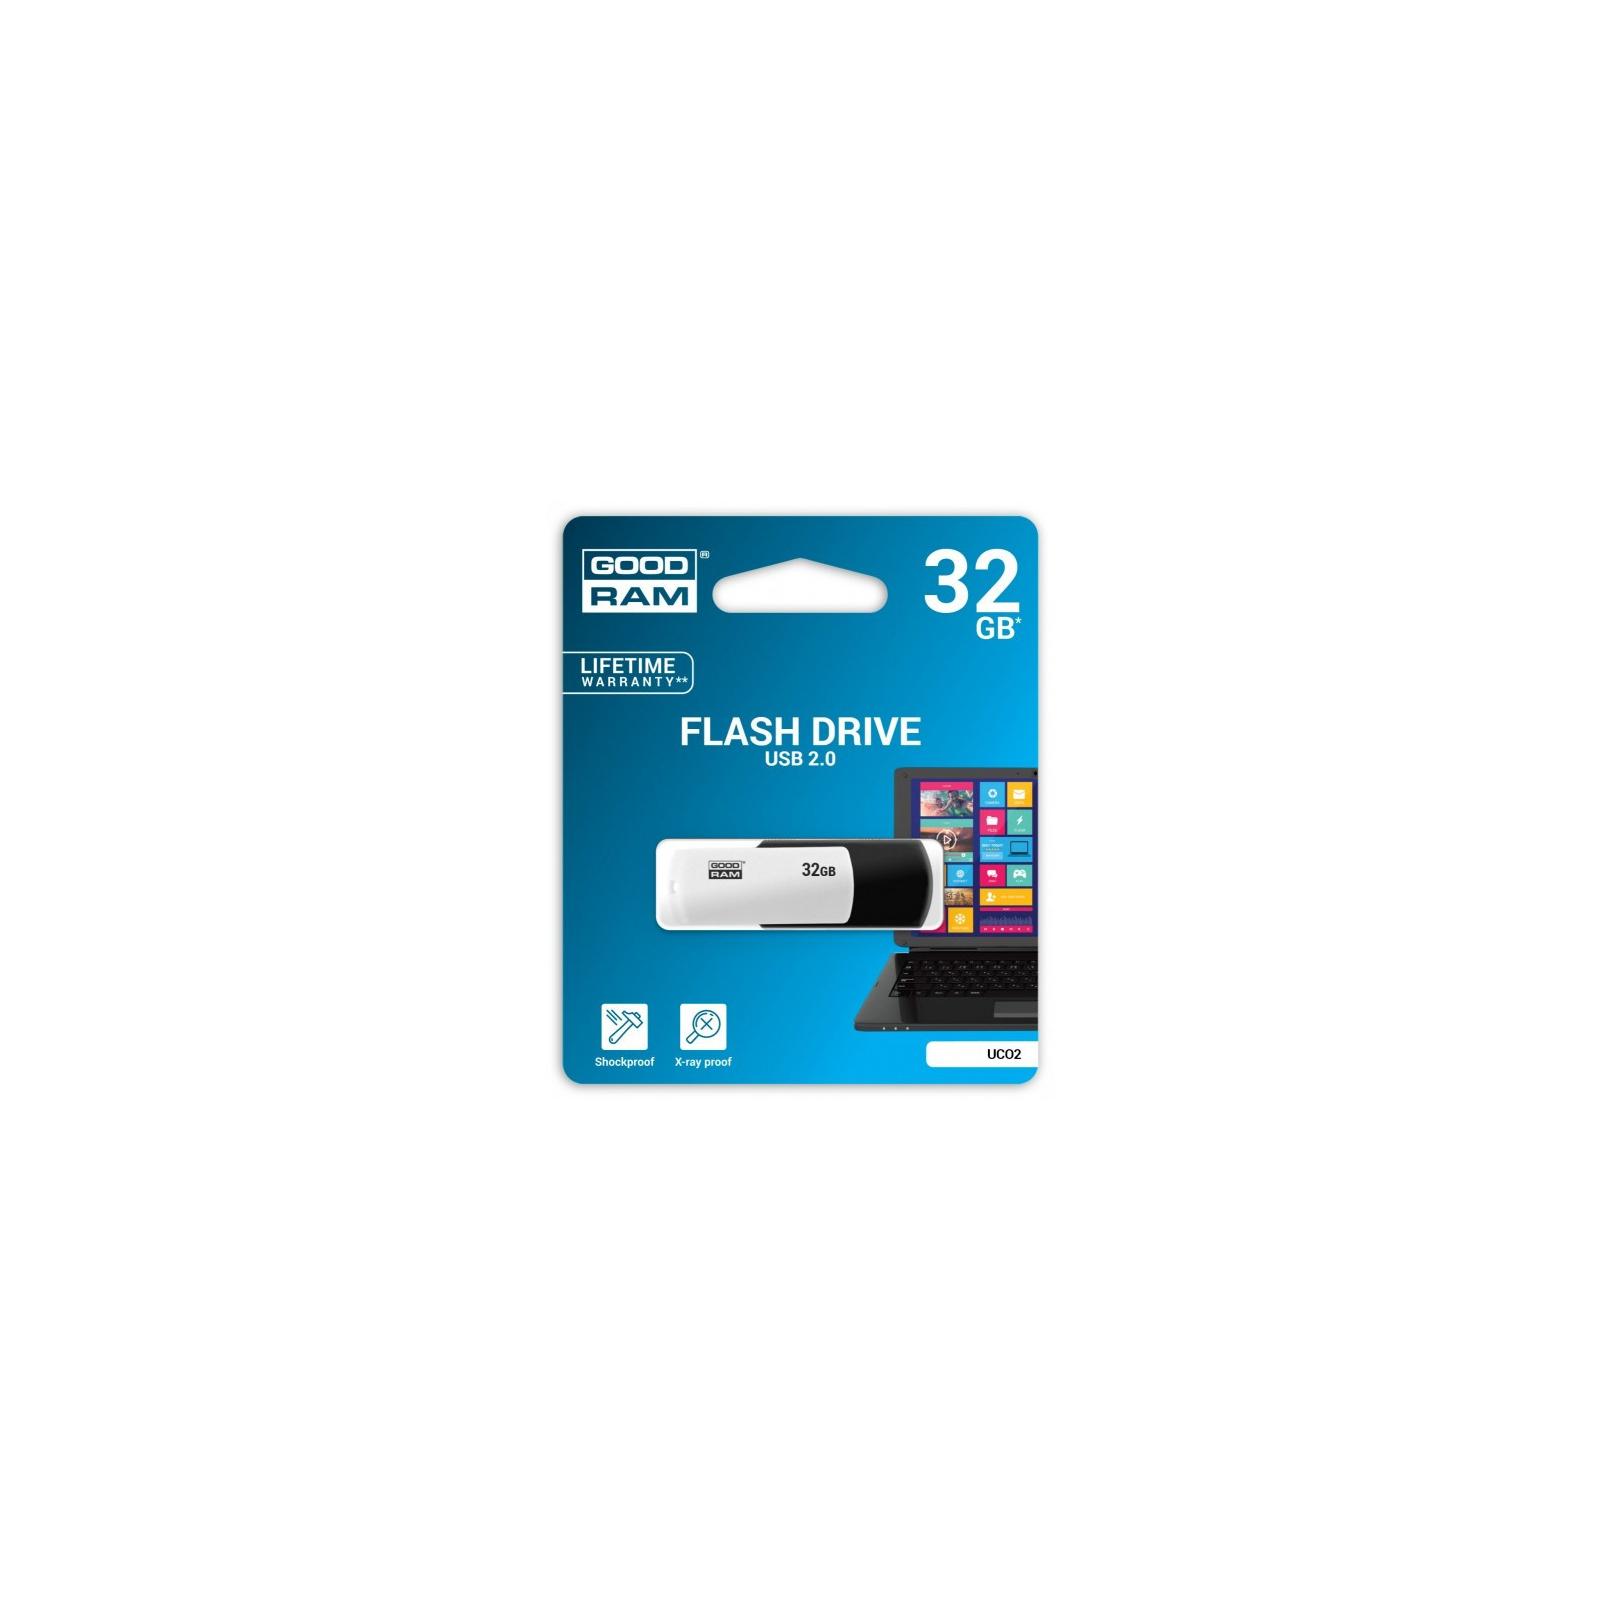 USB флеш накопитель Goodram 16GB UCO2 (Colour Mix) Black/White USB 2.0 (UCO2-0160KWR11) изображение 2